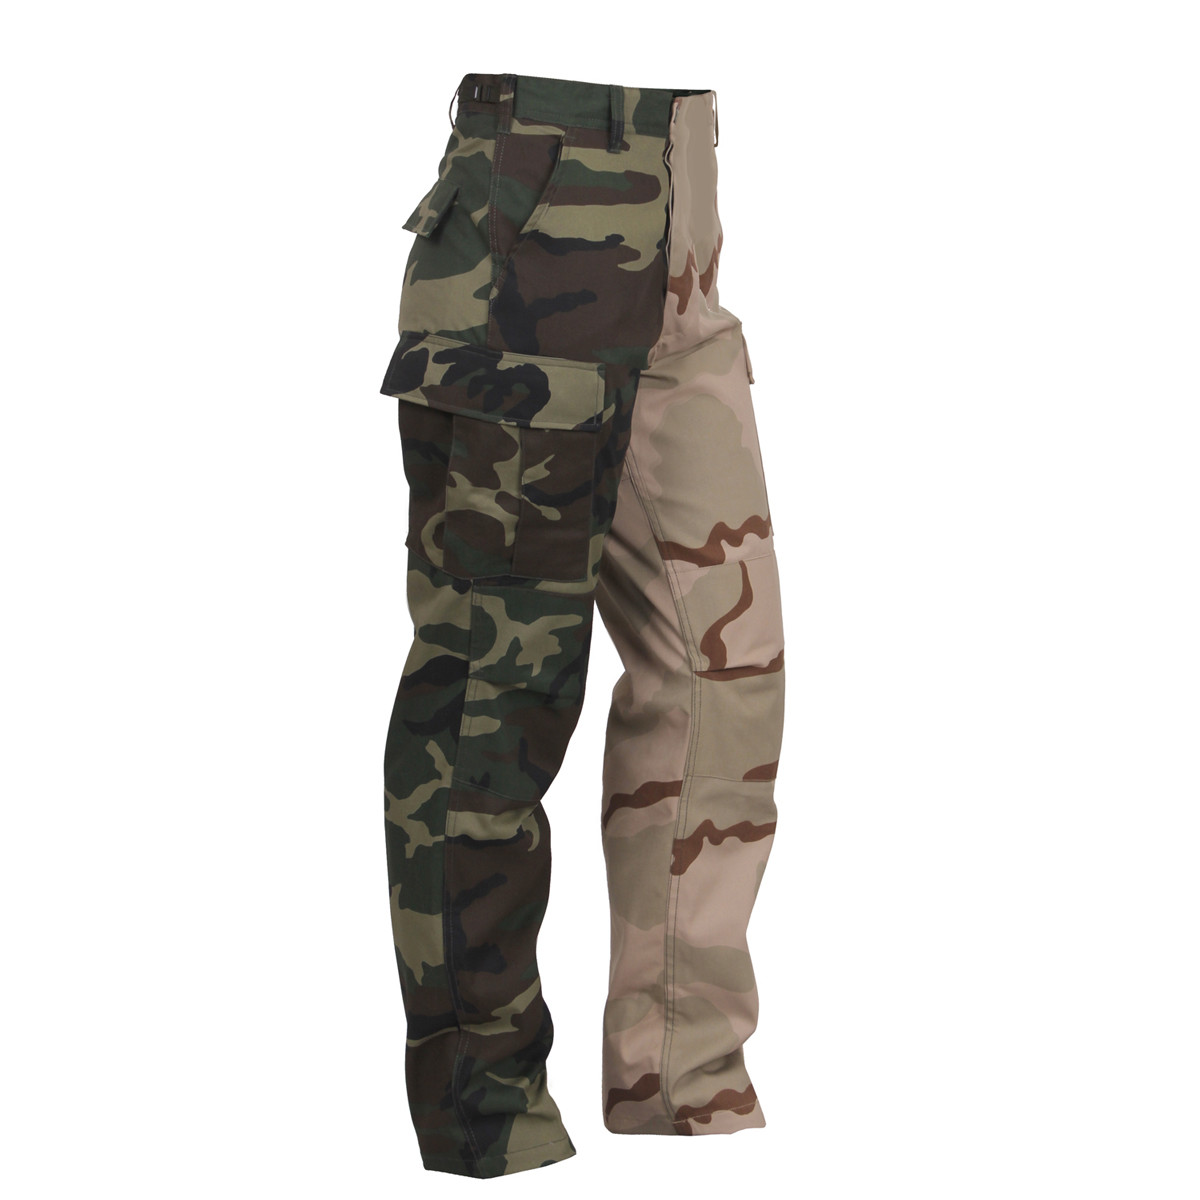 08234a2d16a580 Shop Two Tone Camo Pants - Fatigues Army Navy Gear